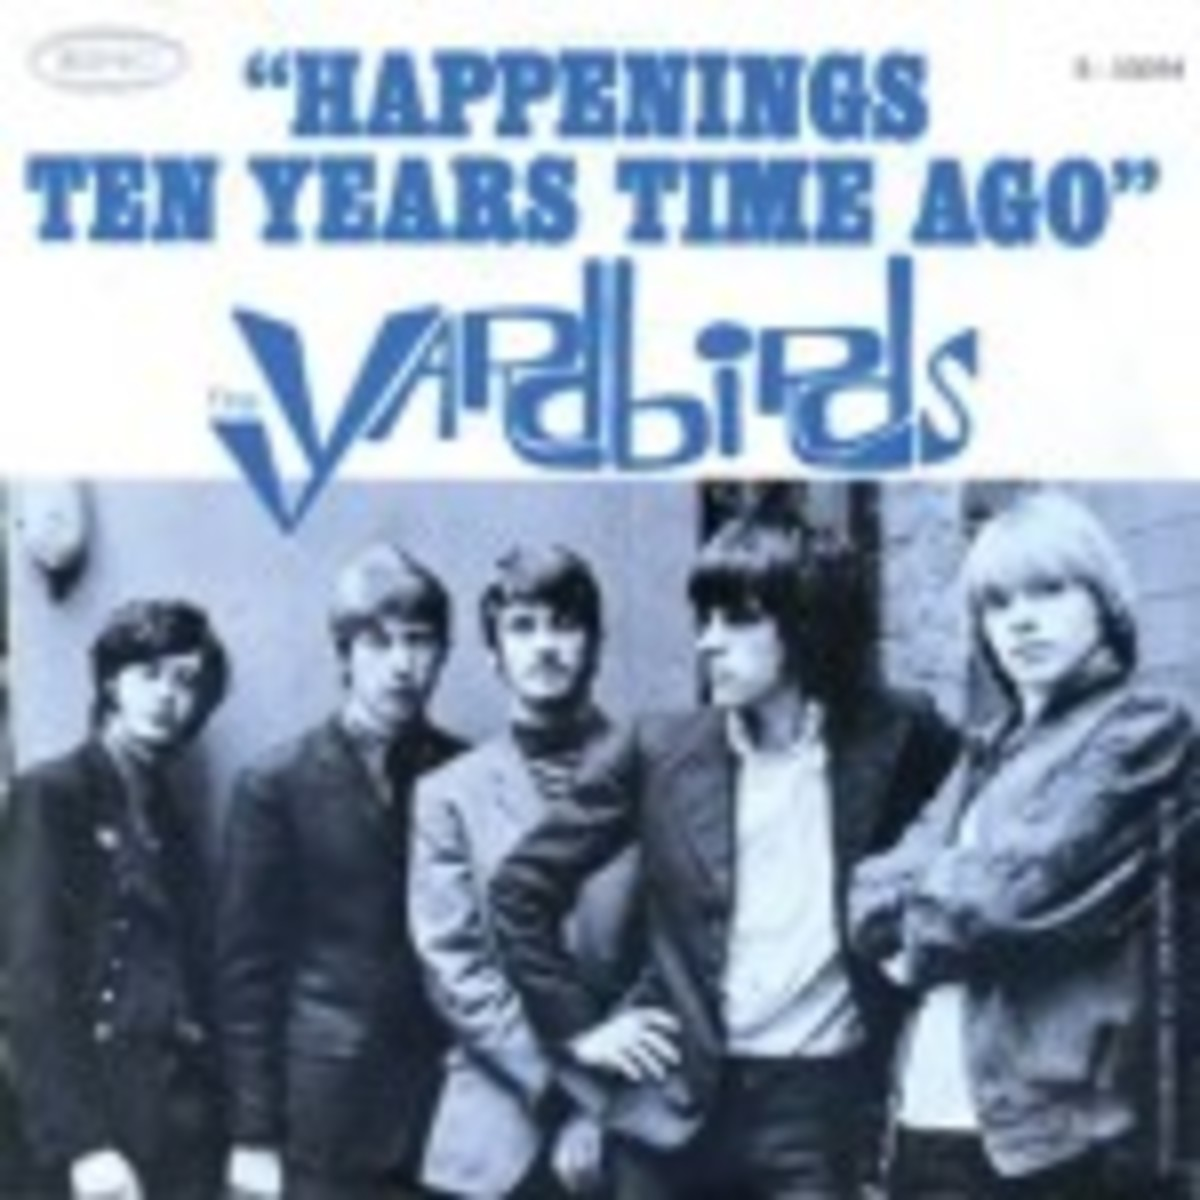 Yardbirds Ten Years Time Ago picture sleeve